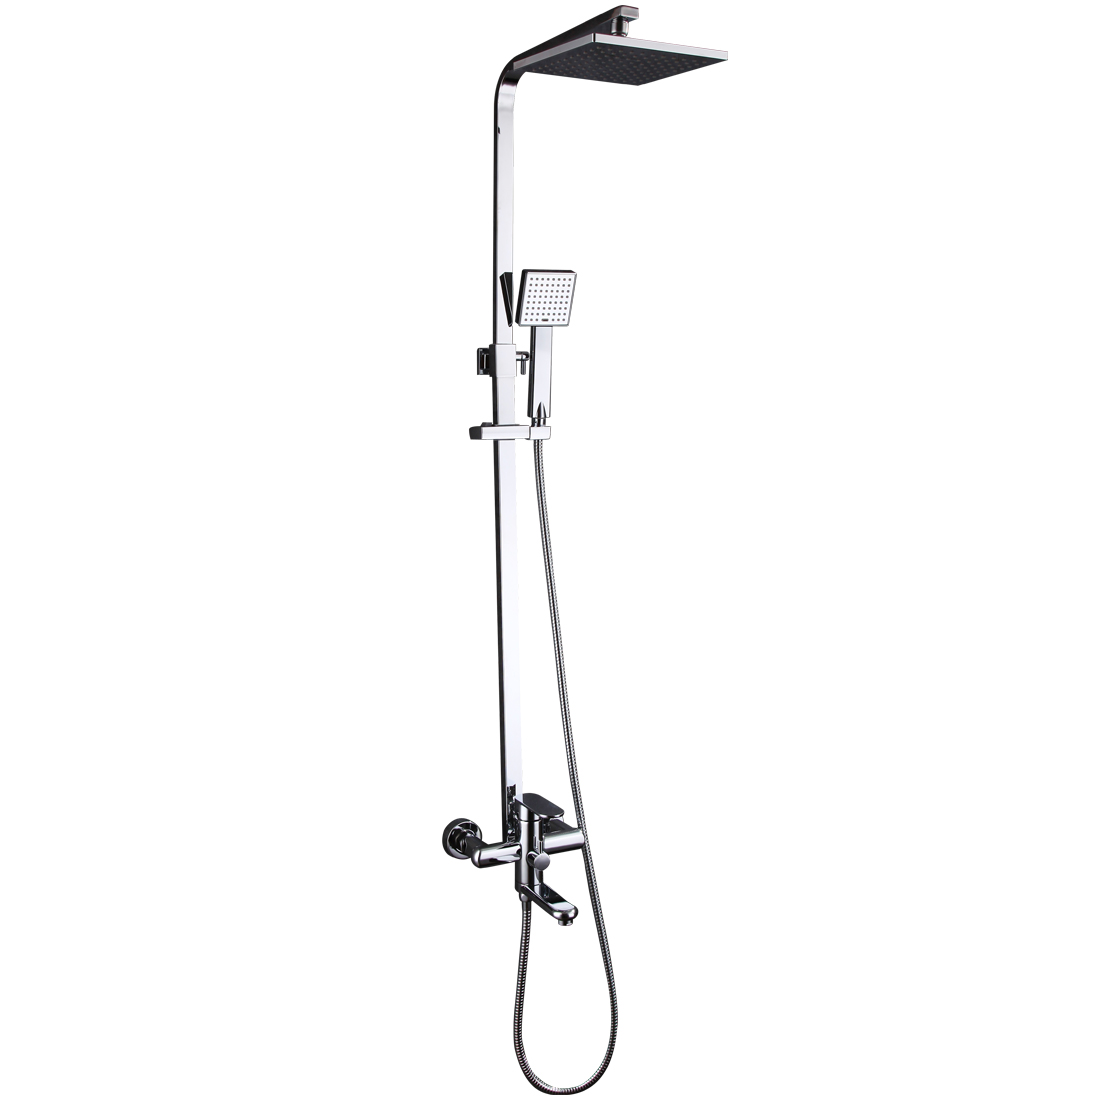 8 Tub Fixtures Bathroom Rain Shower Faucet System Set Shower Head Han